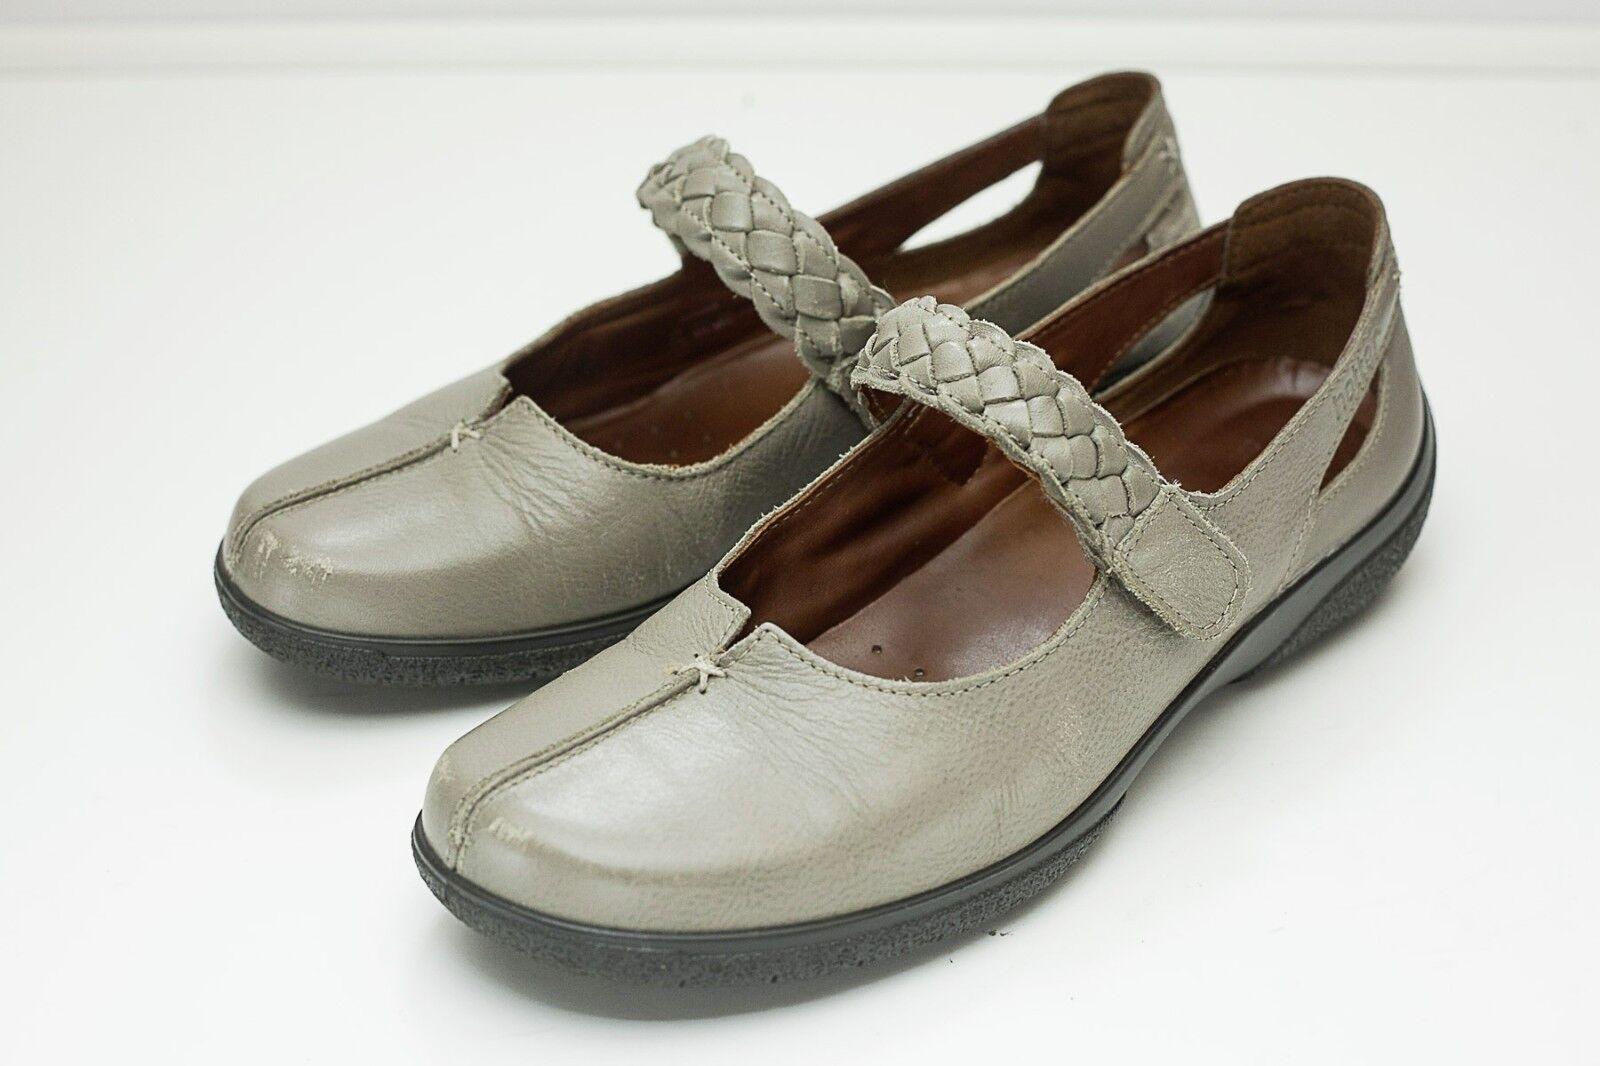 Hotter Shake 9.5 Stone Mary Jane Chaussures Femme